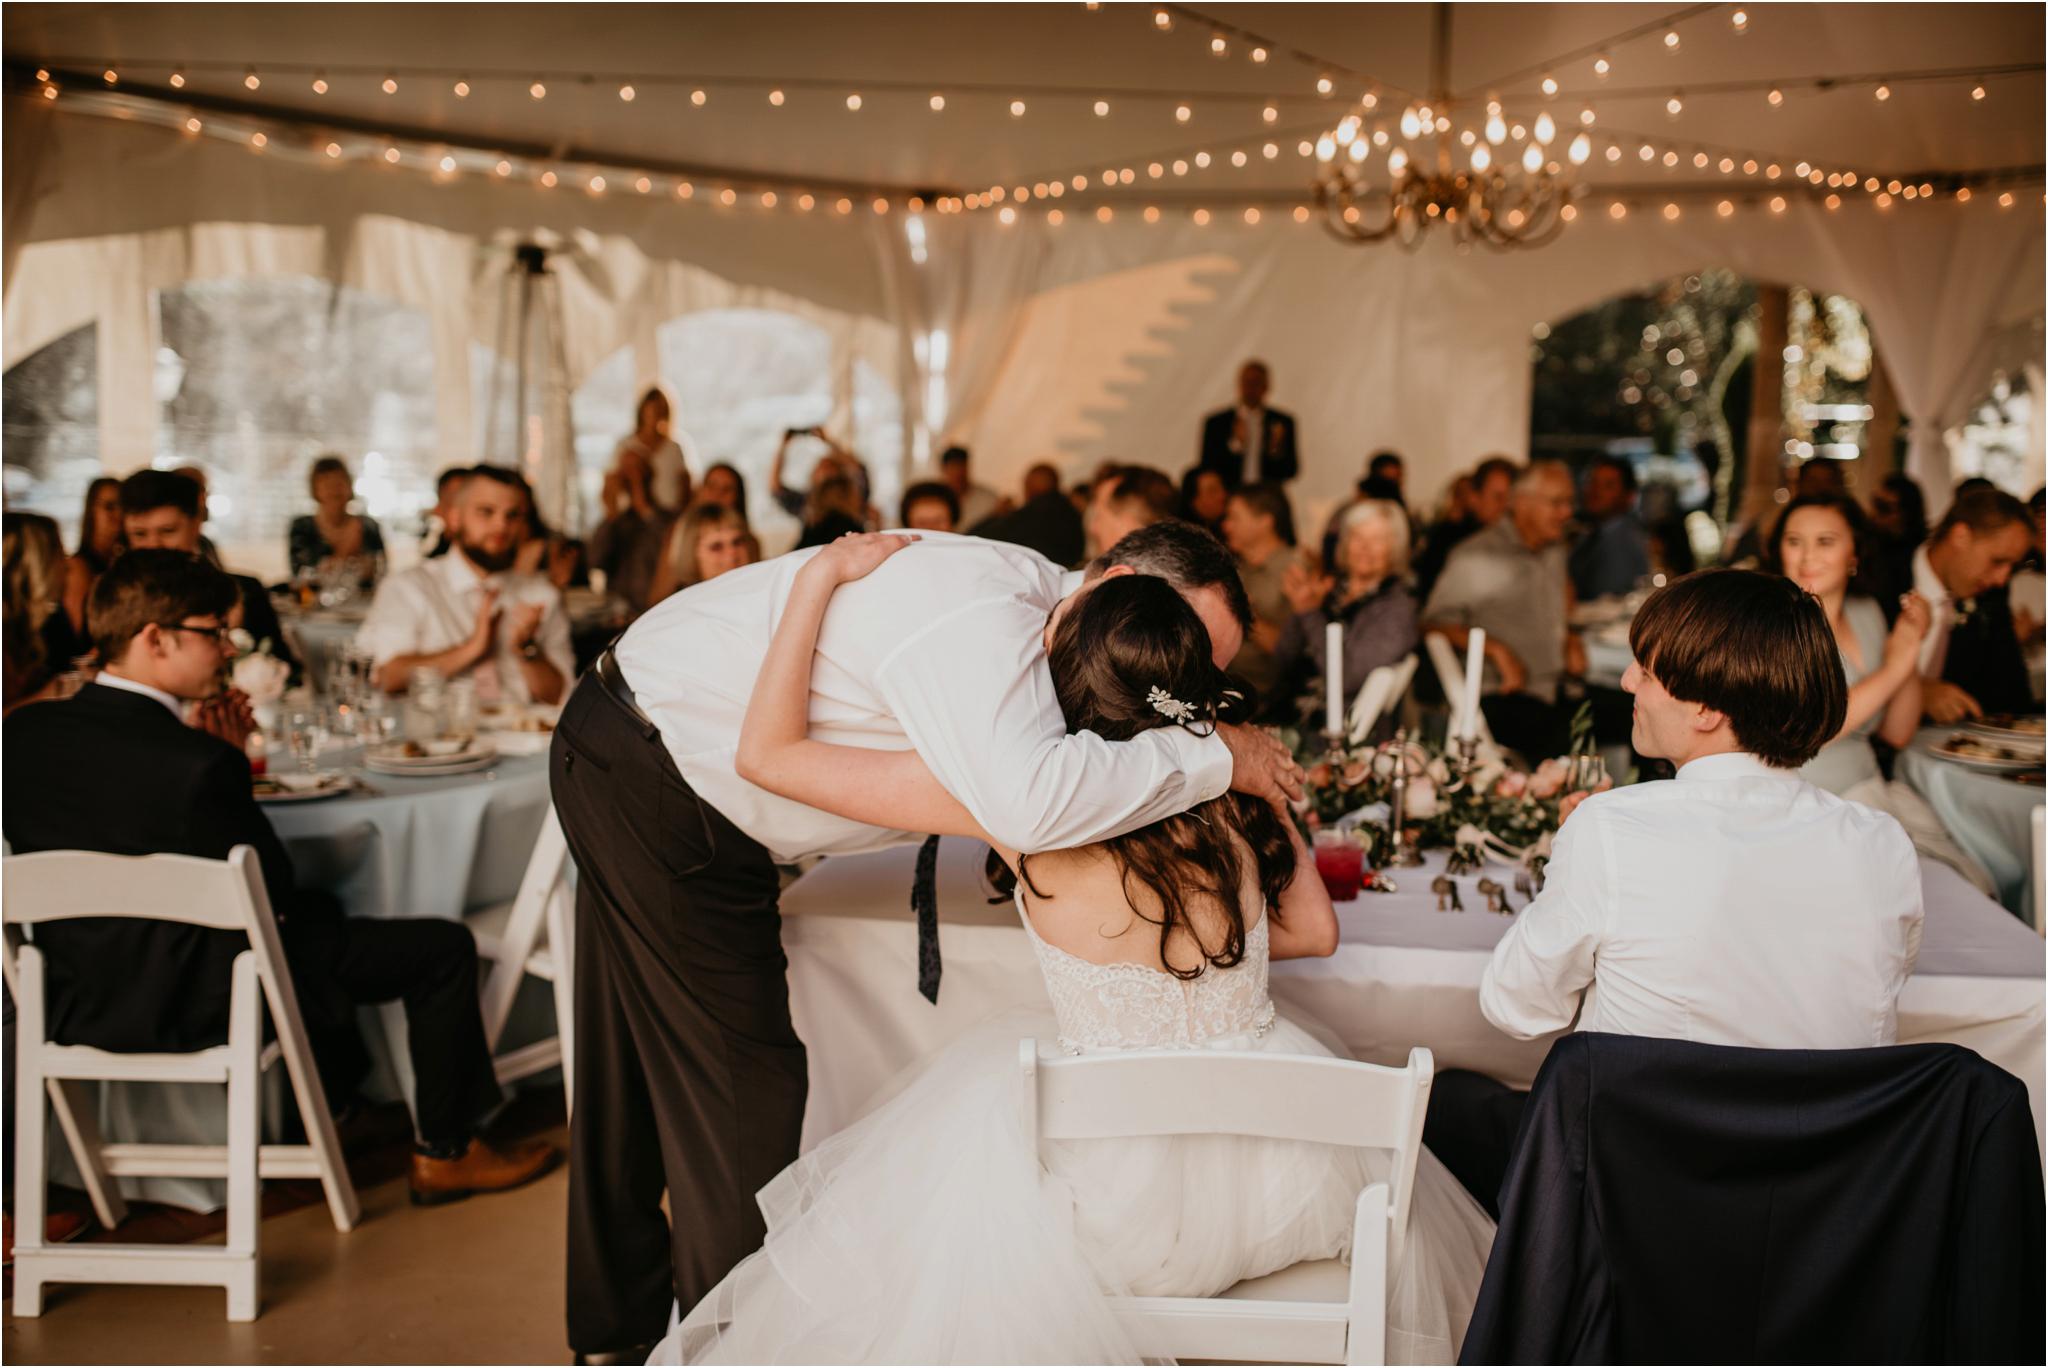 chance-and-ondrea-lairmont-manor-wedding-seattle-photographer-095.jpg